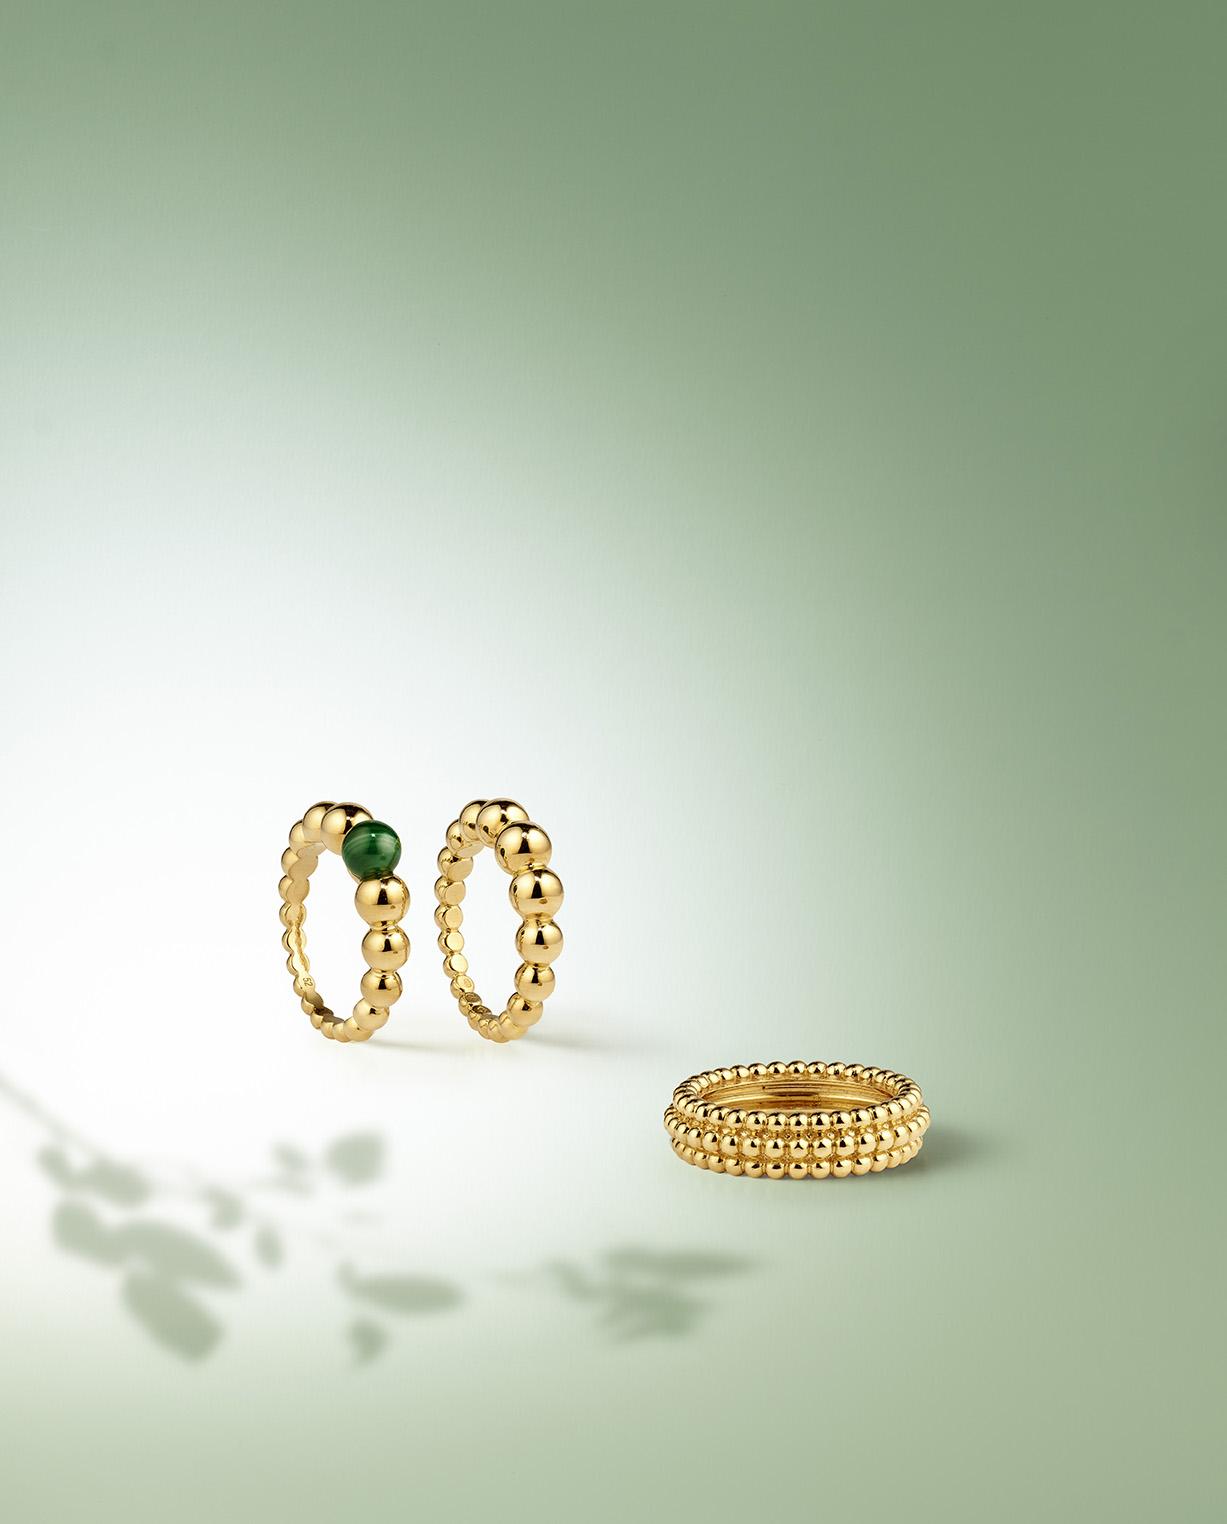 Perlee jewellery